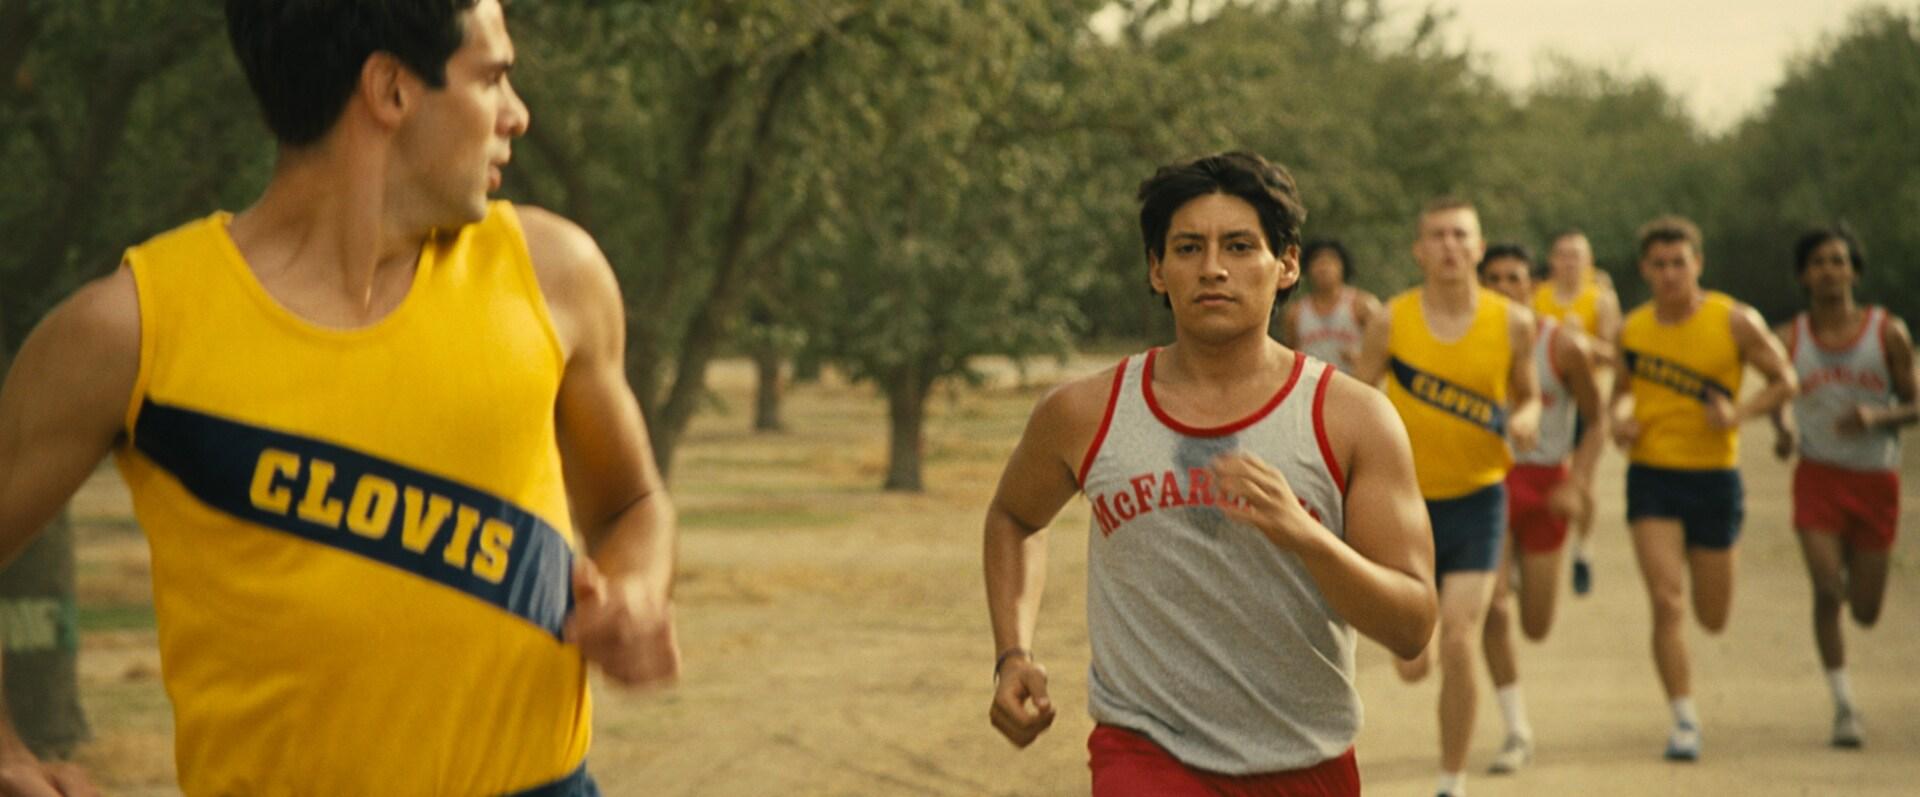 "Carlos Pratts as Thomas Valles in ""McFarland, USA"""